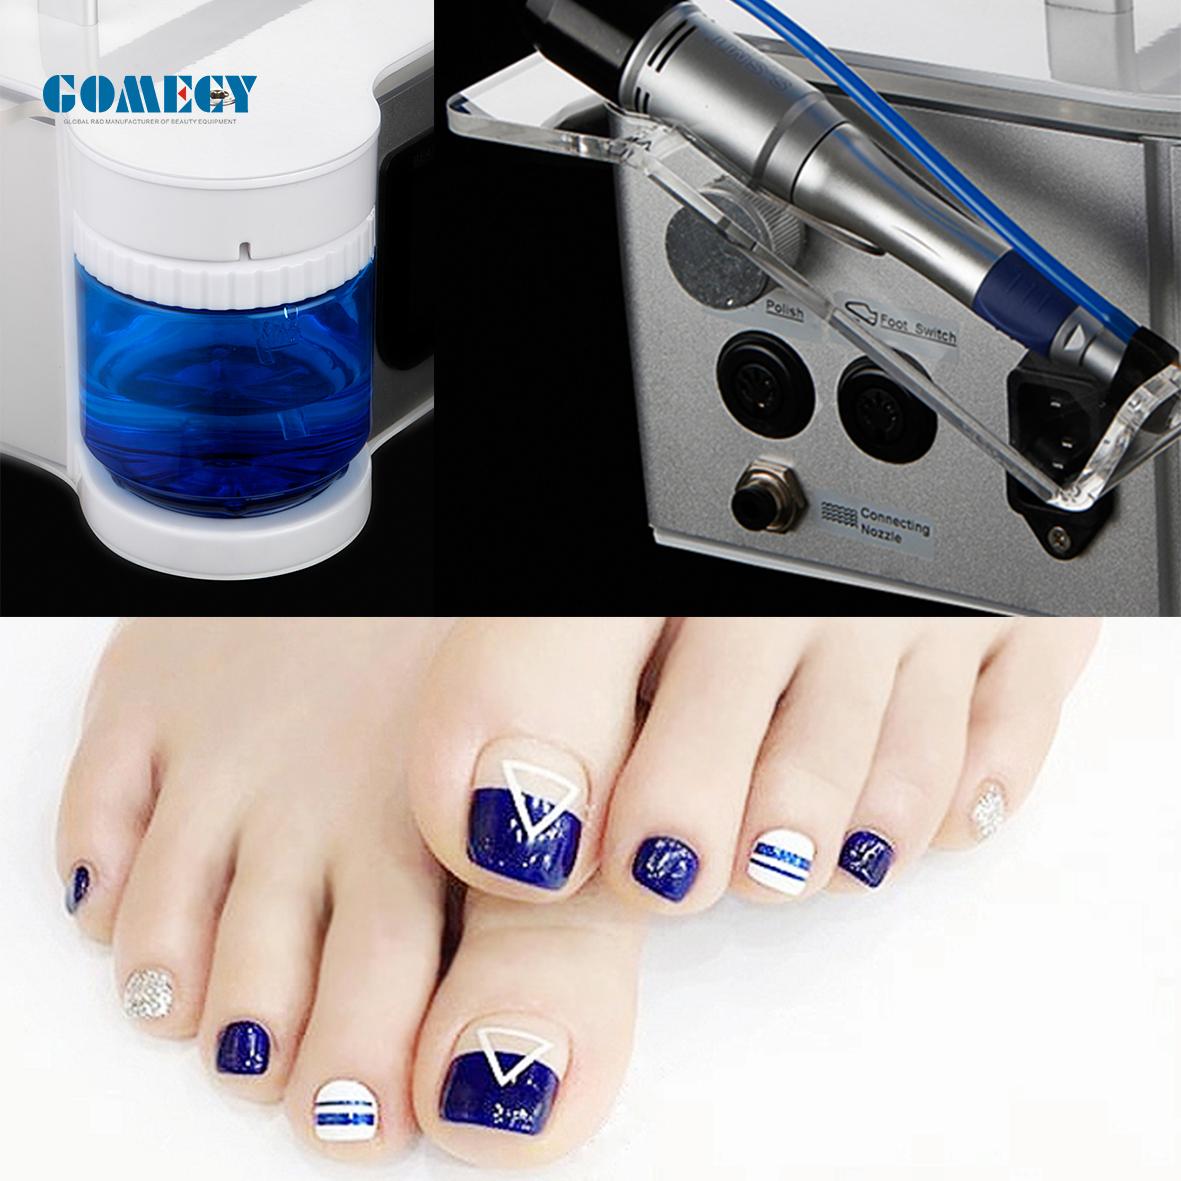 Clinic spa salon Nail drilling electric manicure pedicure tools drill machine nail files electric polisher manicure